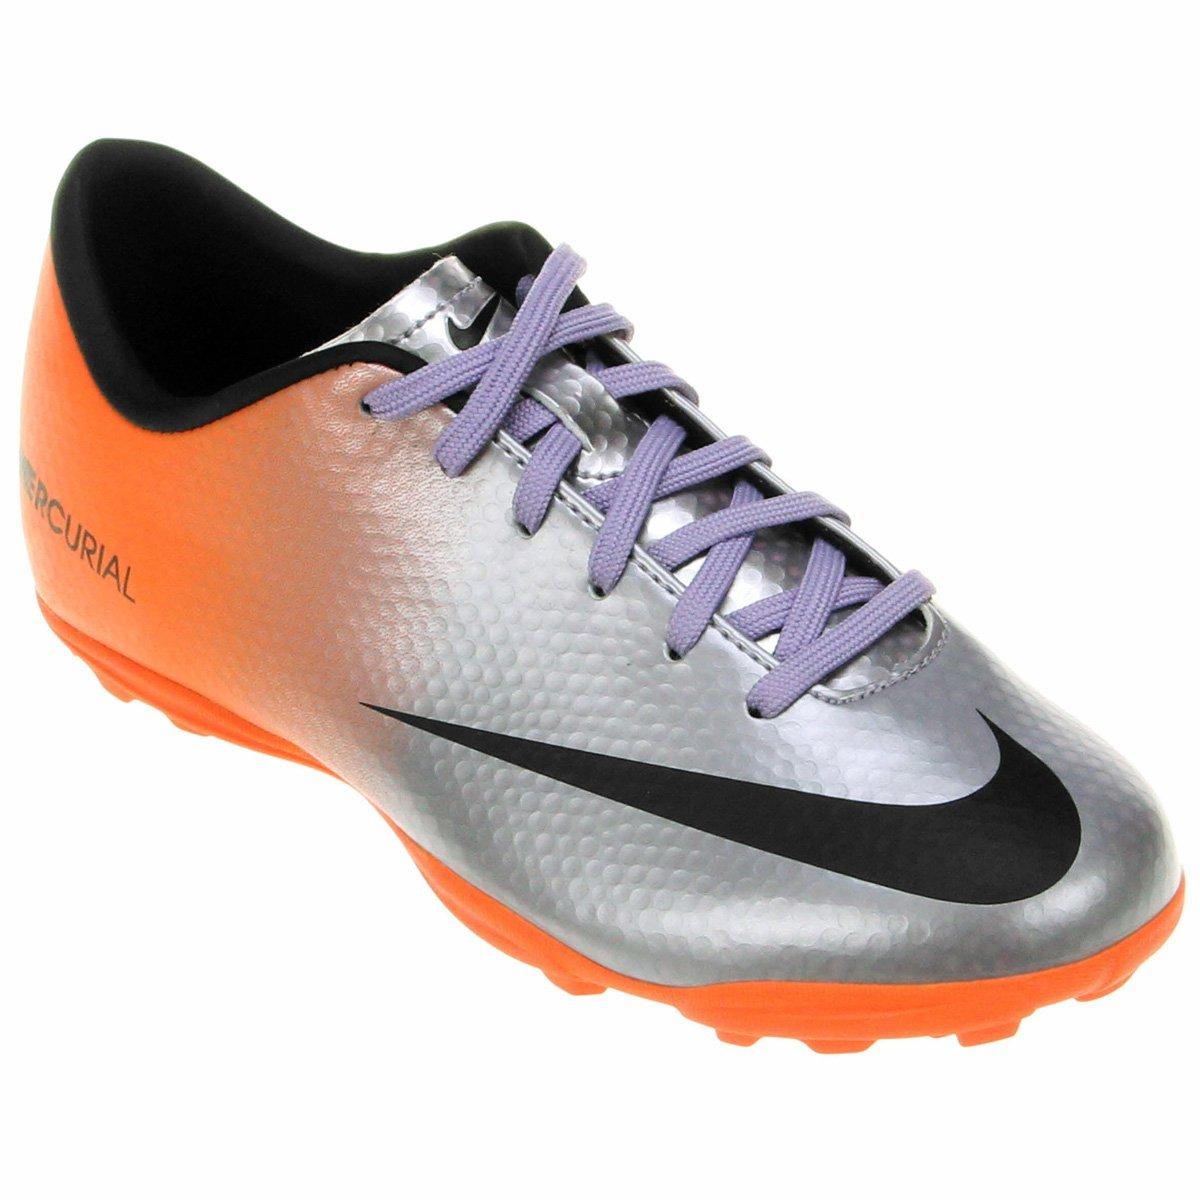 66c81707ab Chuteira Nike Mercurial Victory IV TF Infantil